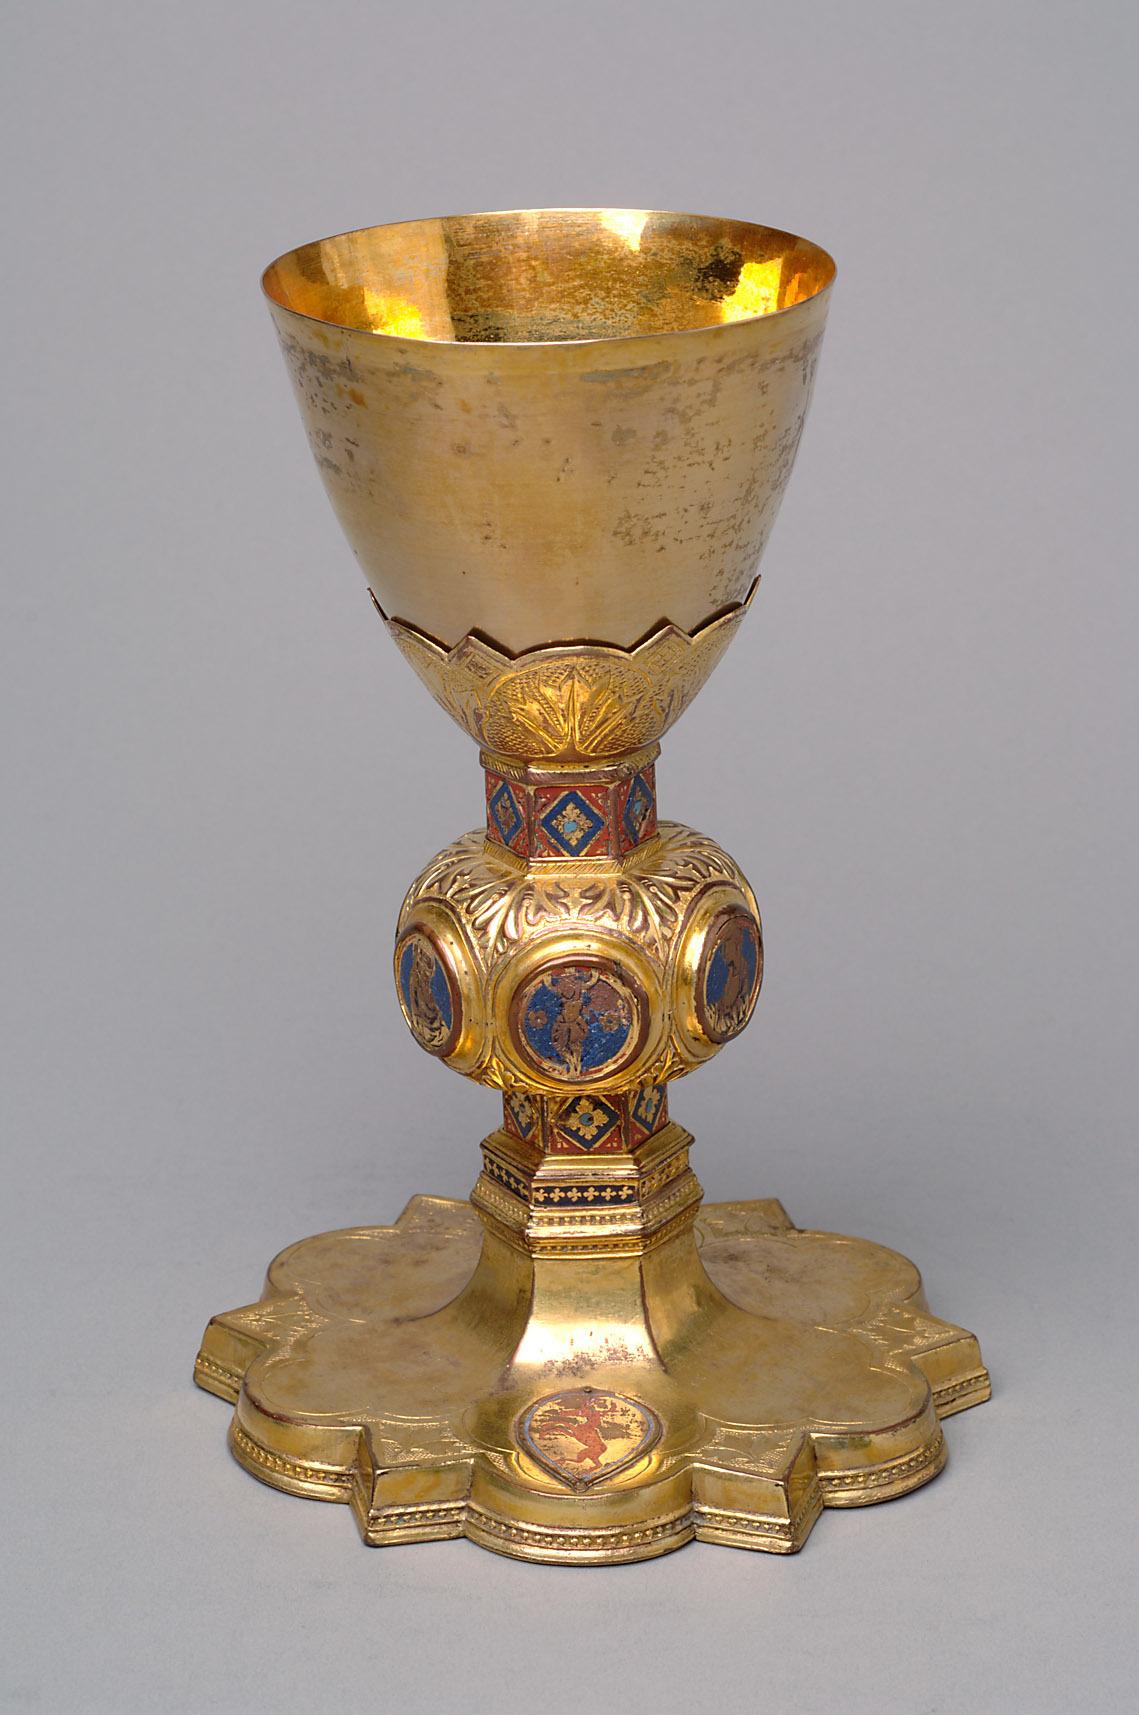 Meßkelch mit Patene aus dem Besitz Kaiser Maximilians von Mexiko von Tondino di di Guerrino, Tondino